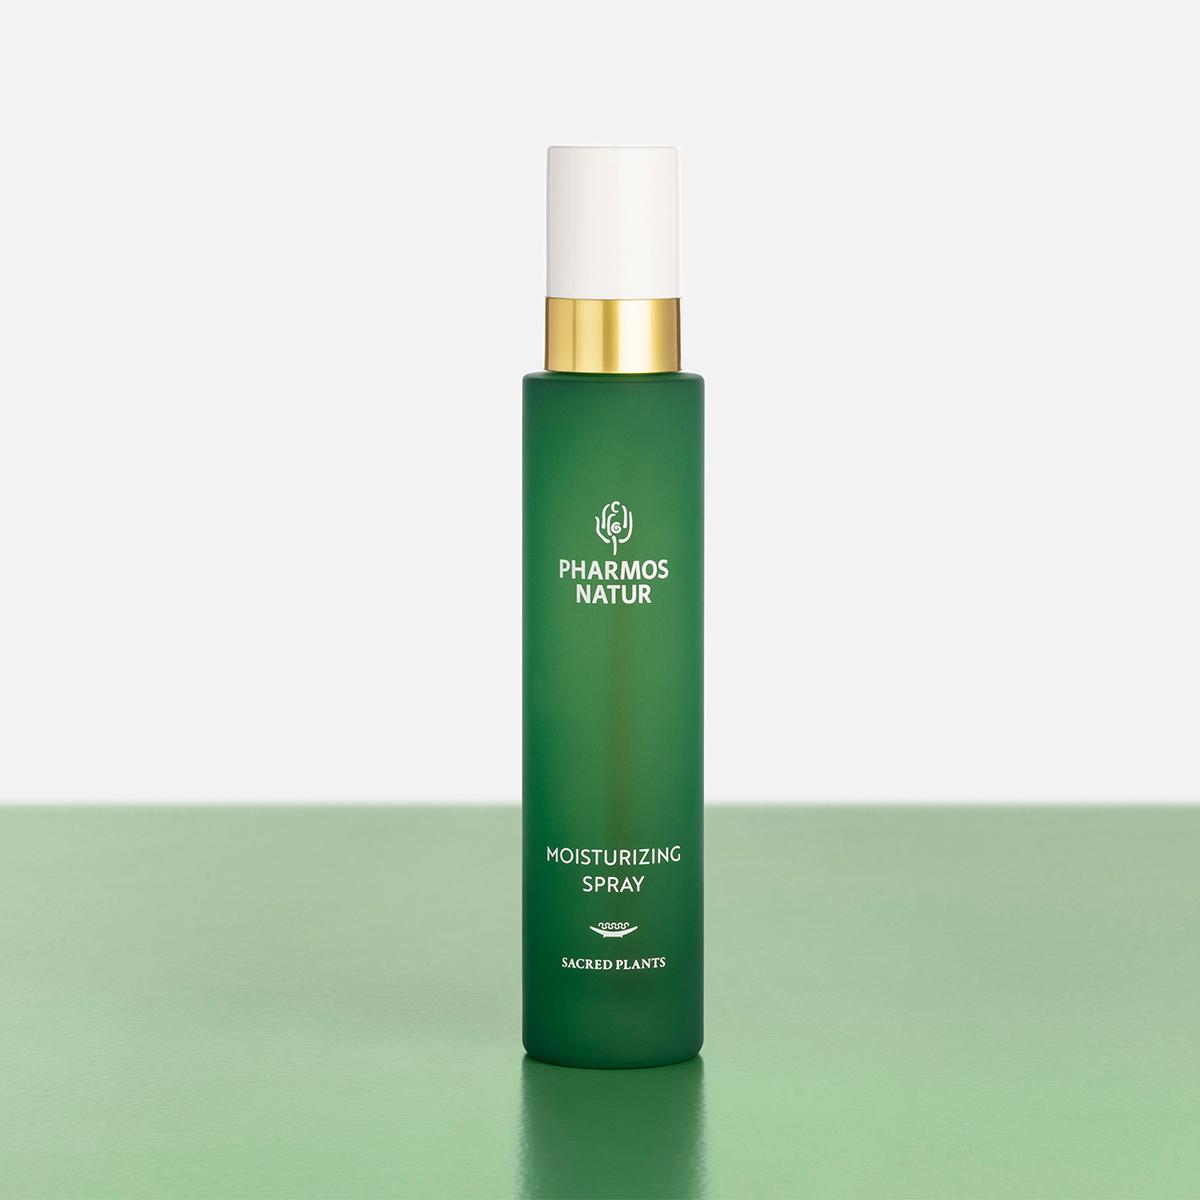 grünes Moisturizing Spray Produktbild